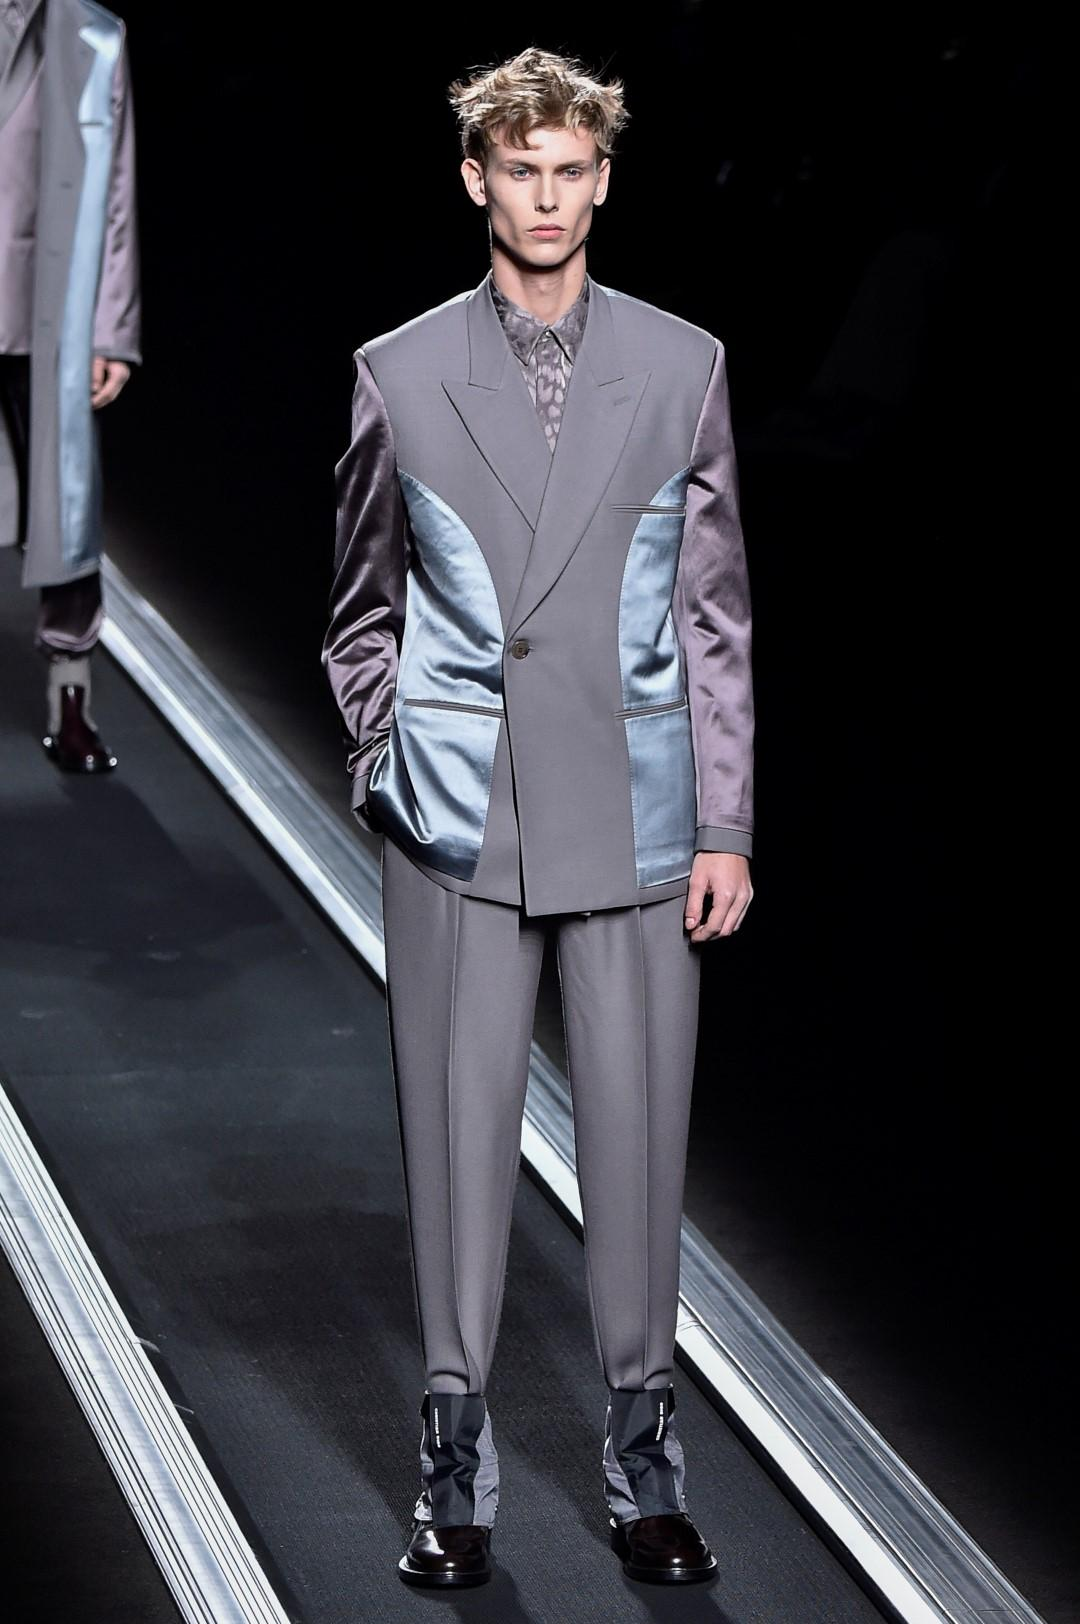 Dior Homme, sartorialità ed eleganza senza compromessi